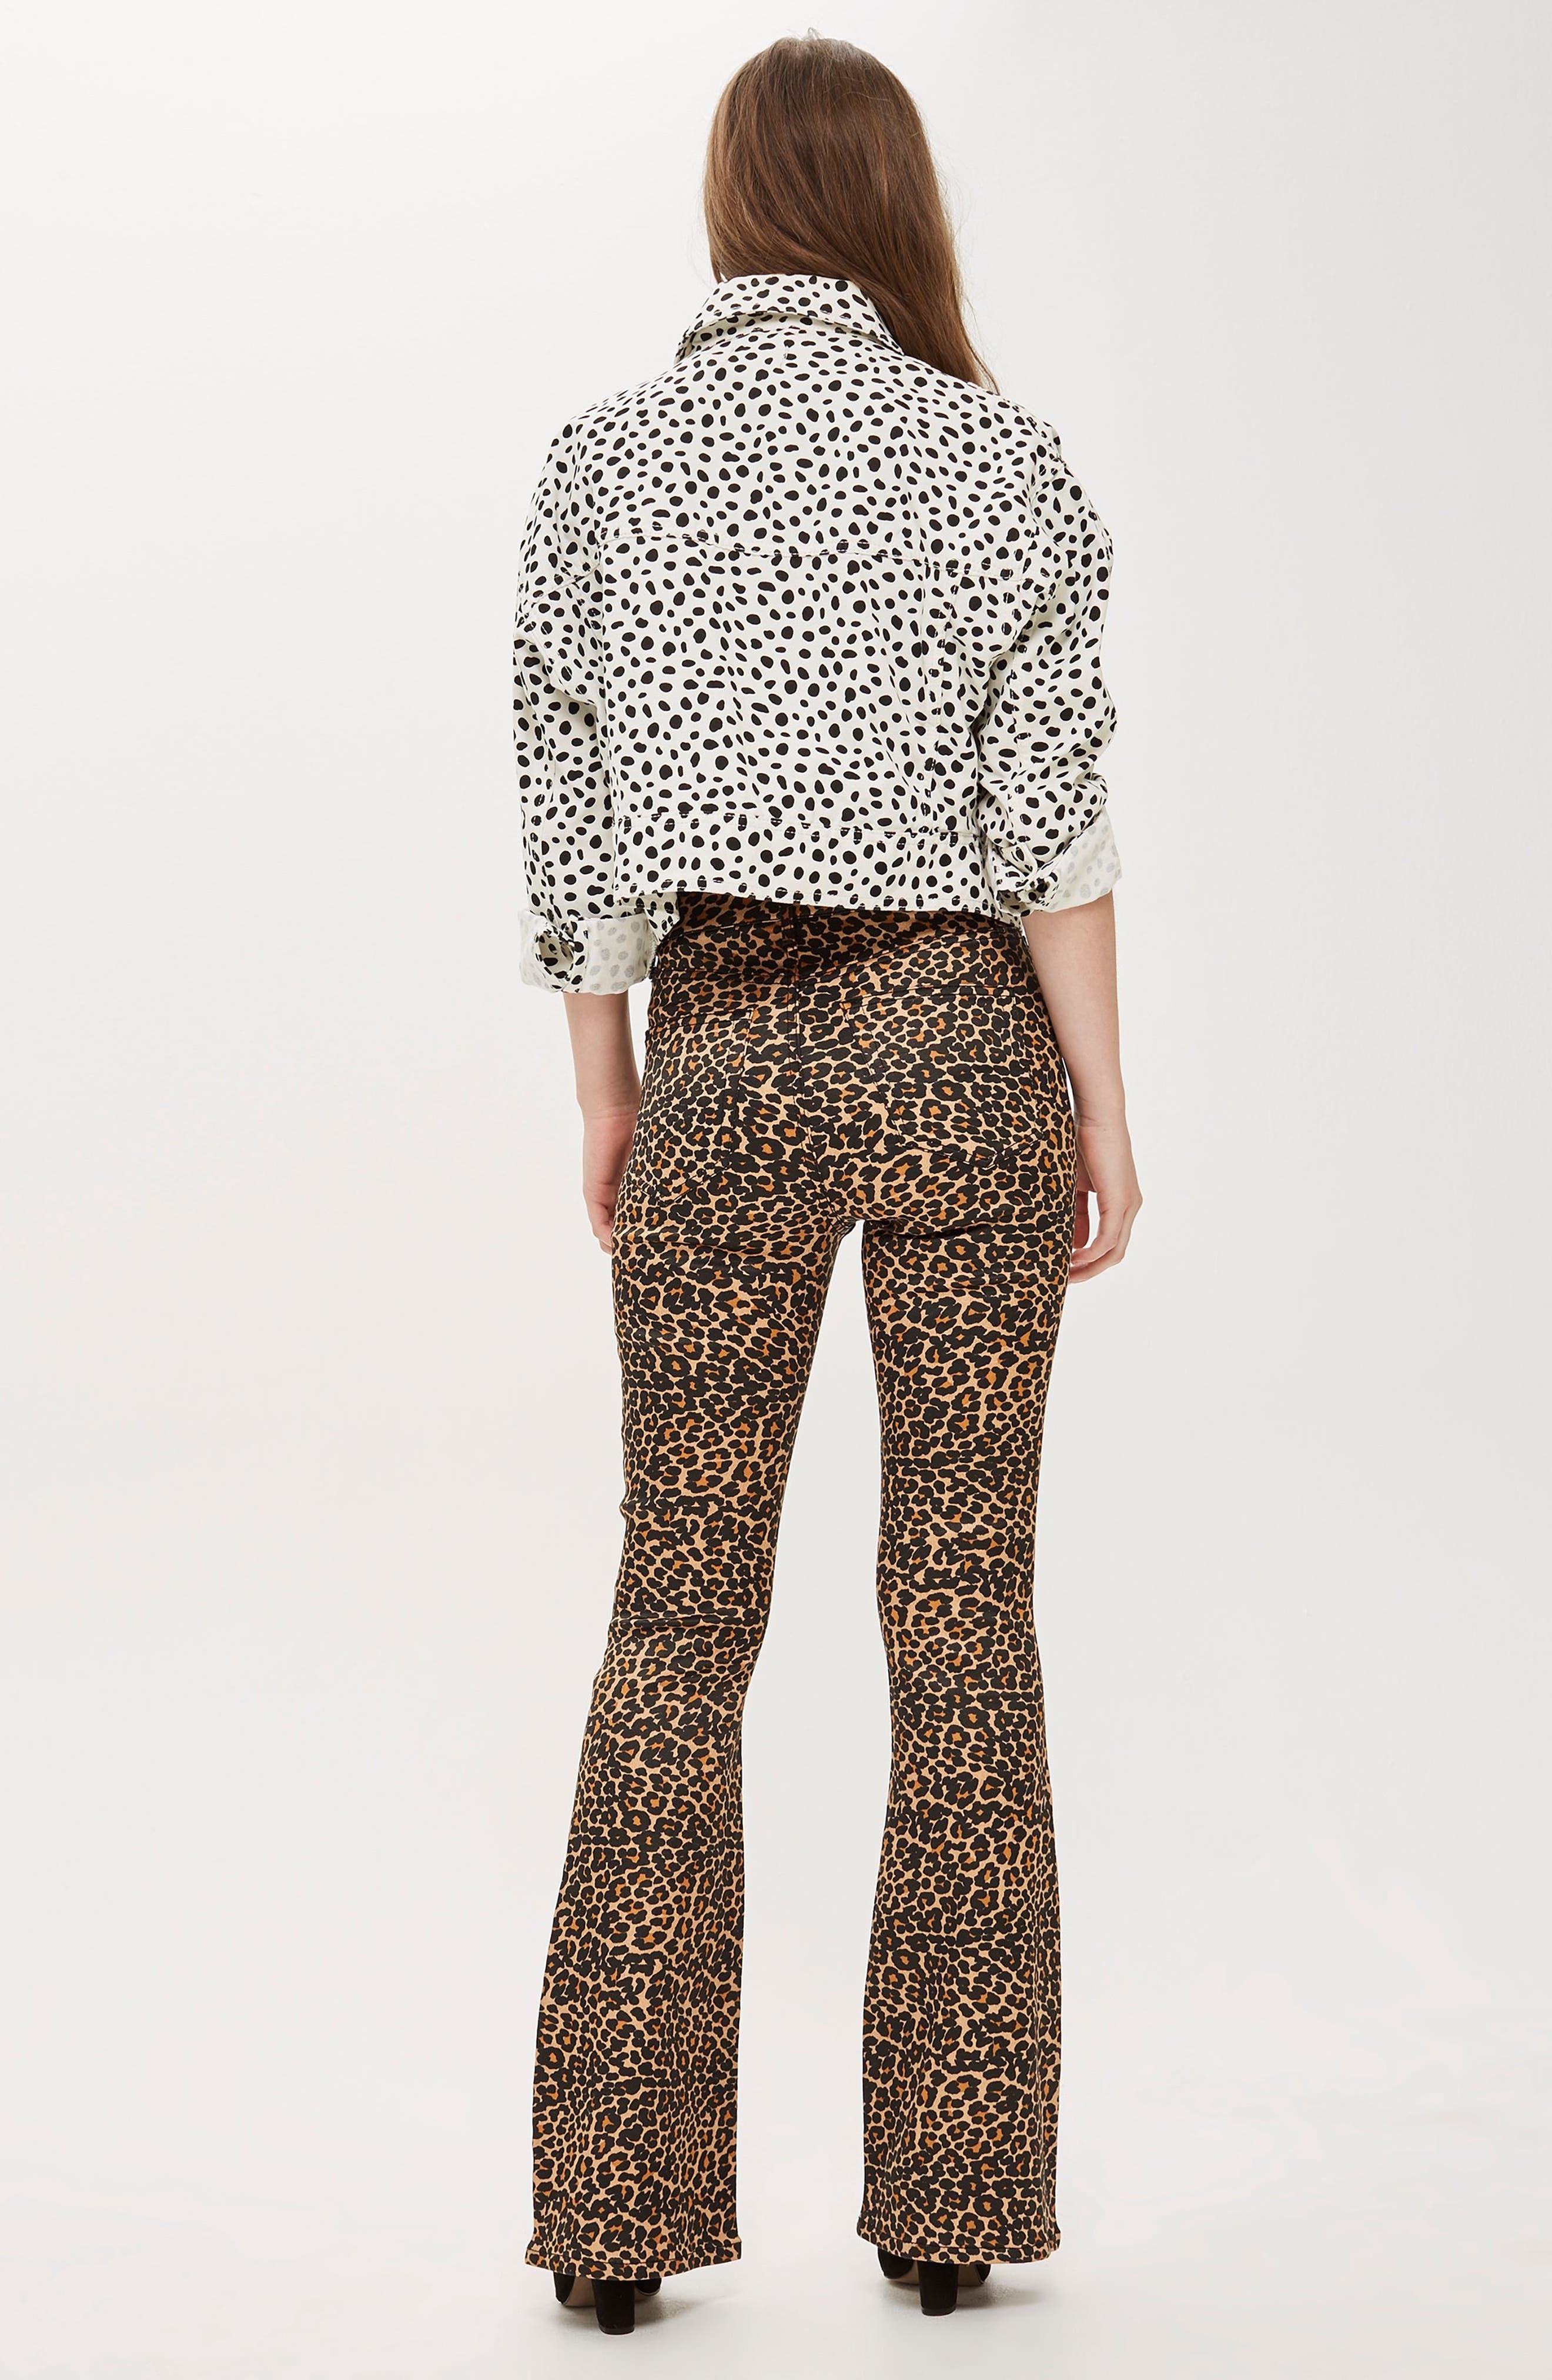 MOTO Leopard Print Flare Jeans,                             Alternate thumbnail 4, color,                             BROWN MULTI